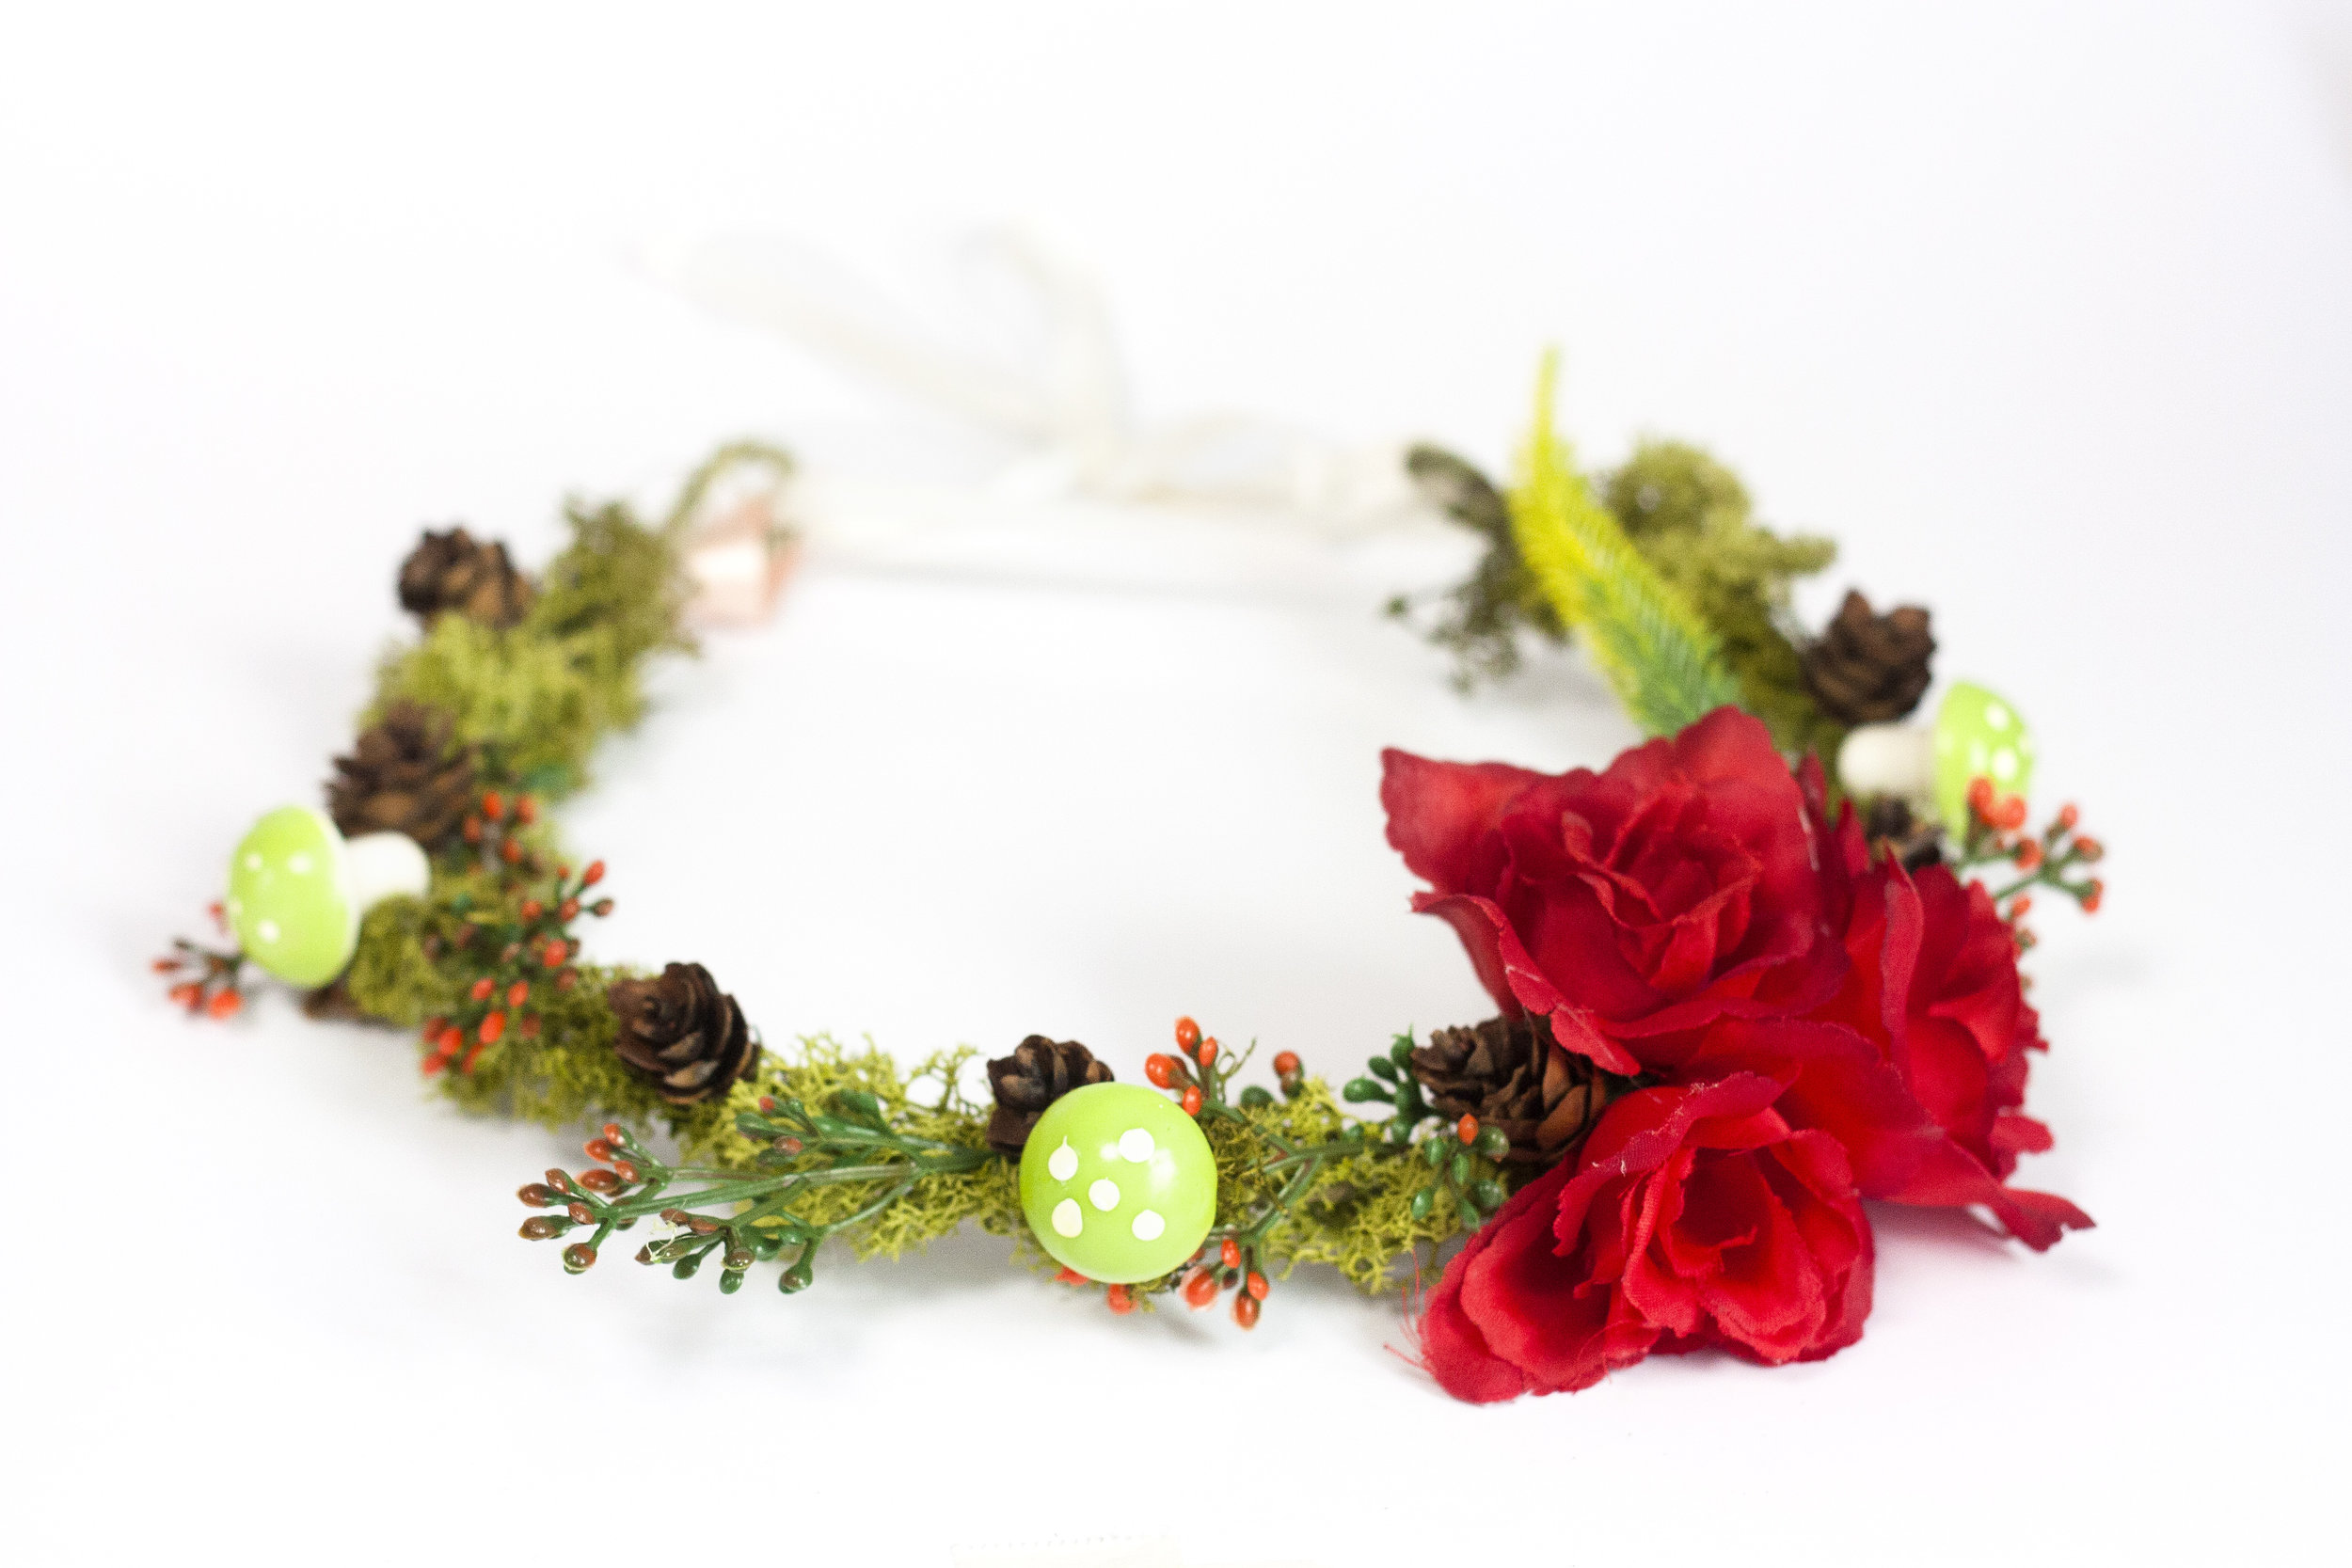 Moss Crown Winter Wedding The Crafty Hen.jpg